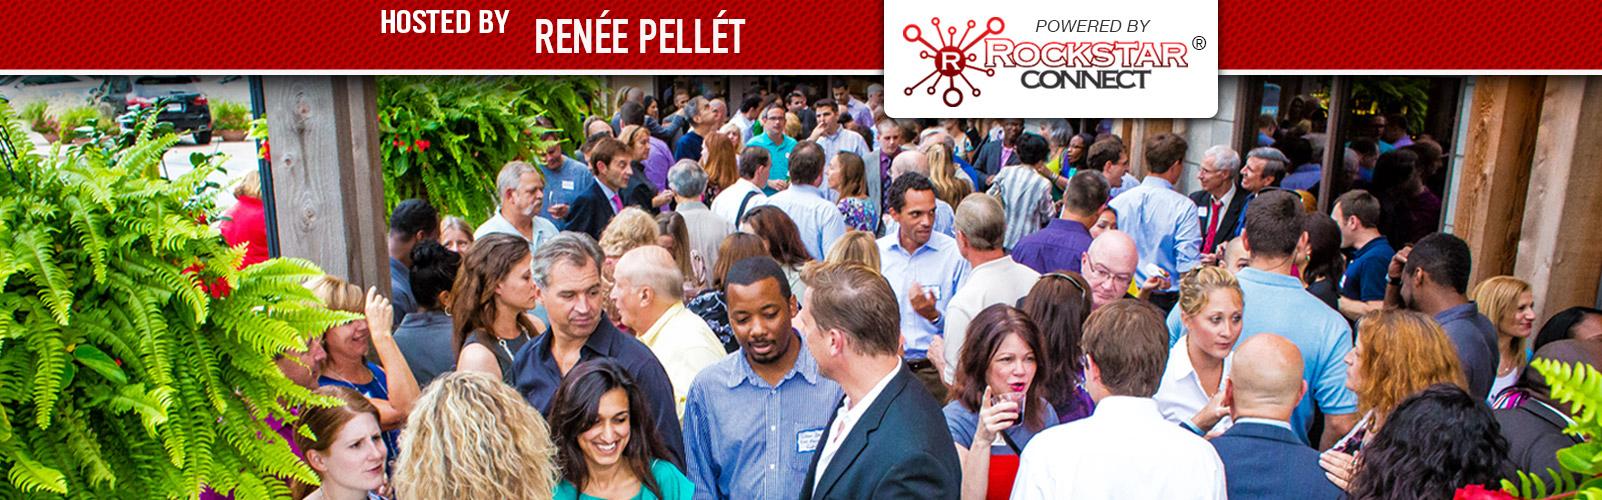 Alliance Networking hosted by Renée Pellét